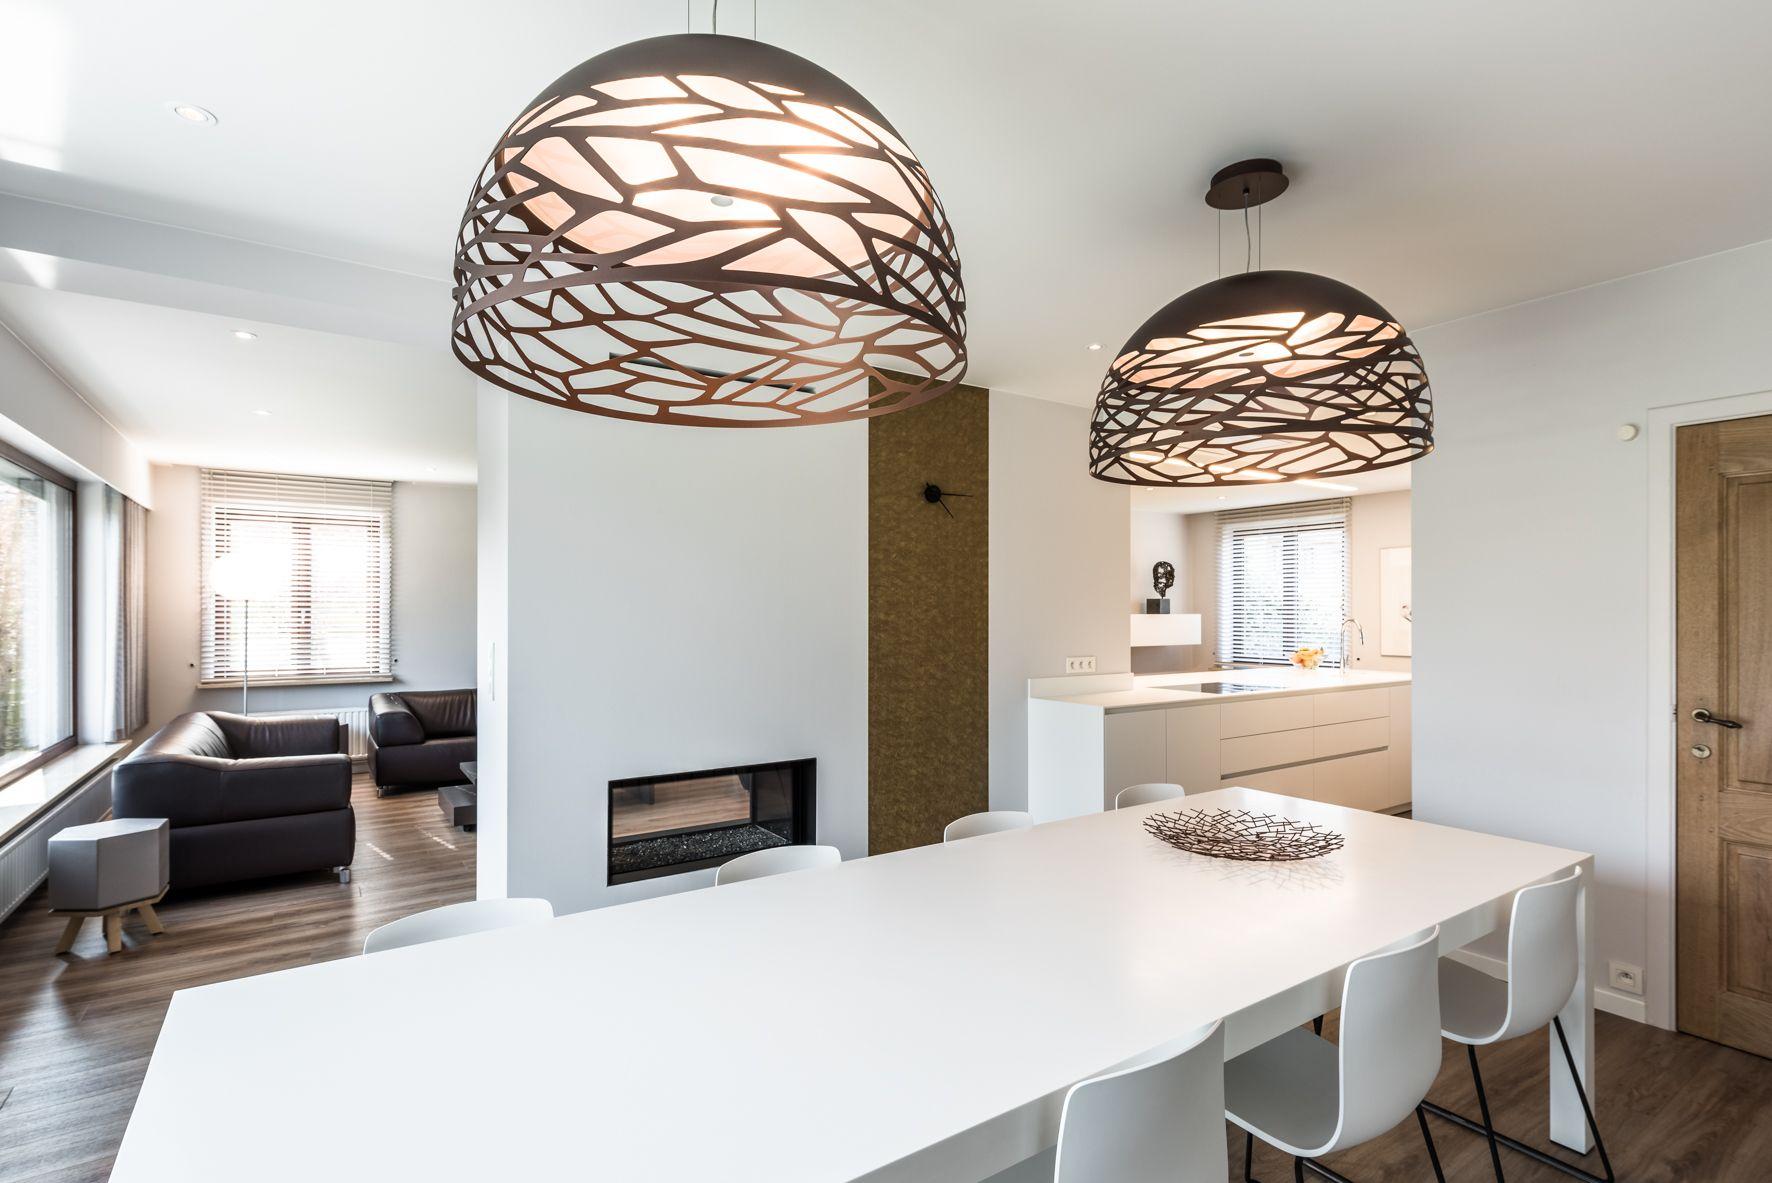 Modern Interieur Woonkamer : Woonkamer interieur renovatie met doorkijkhaard in modern